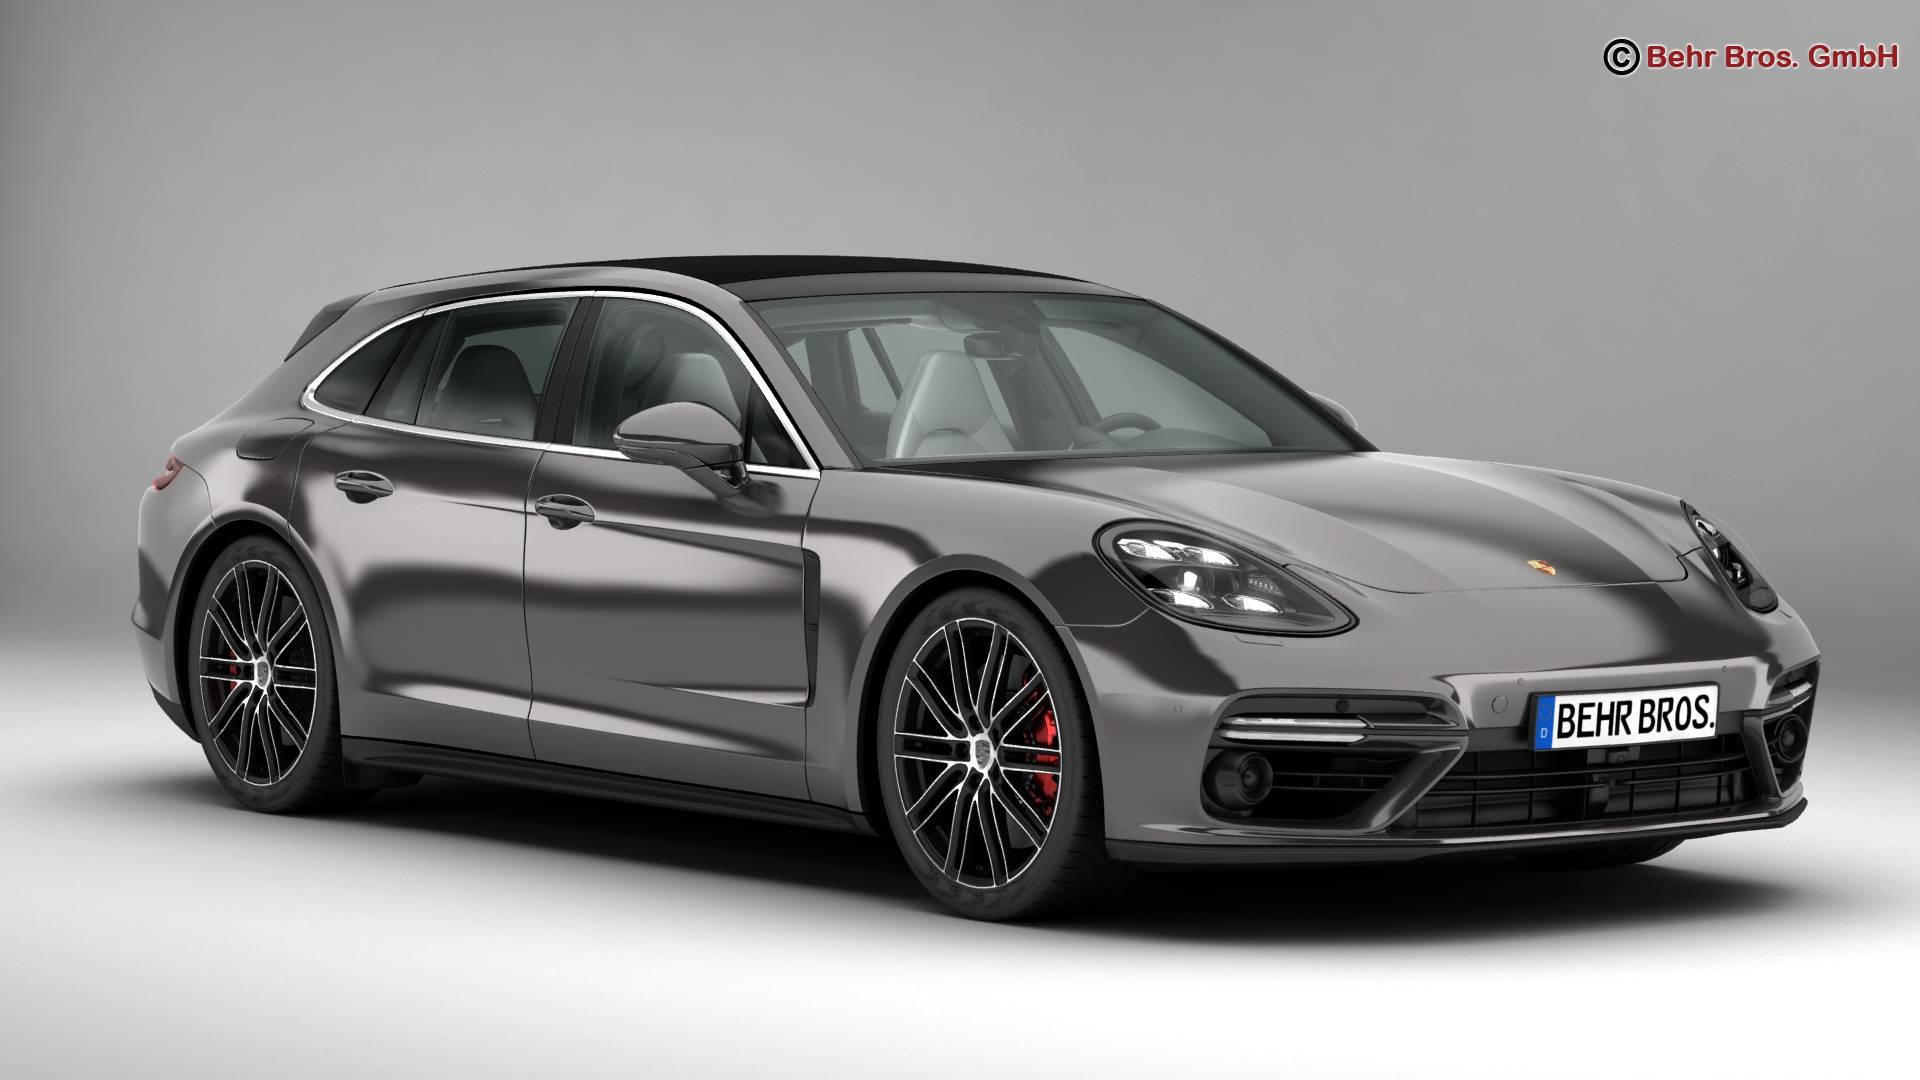 Porsche Panamera Sport Turismo Turbo 2018 3d Model